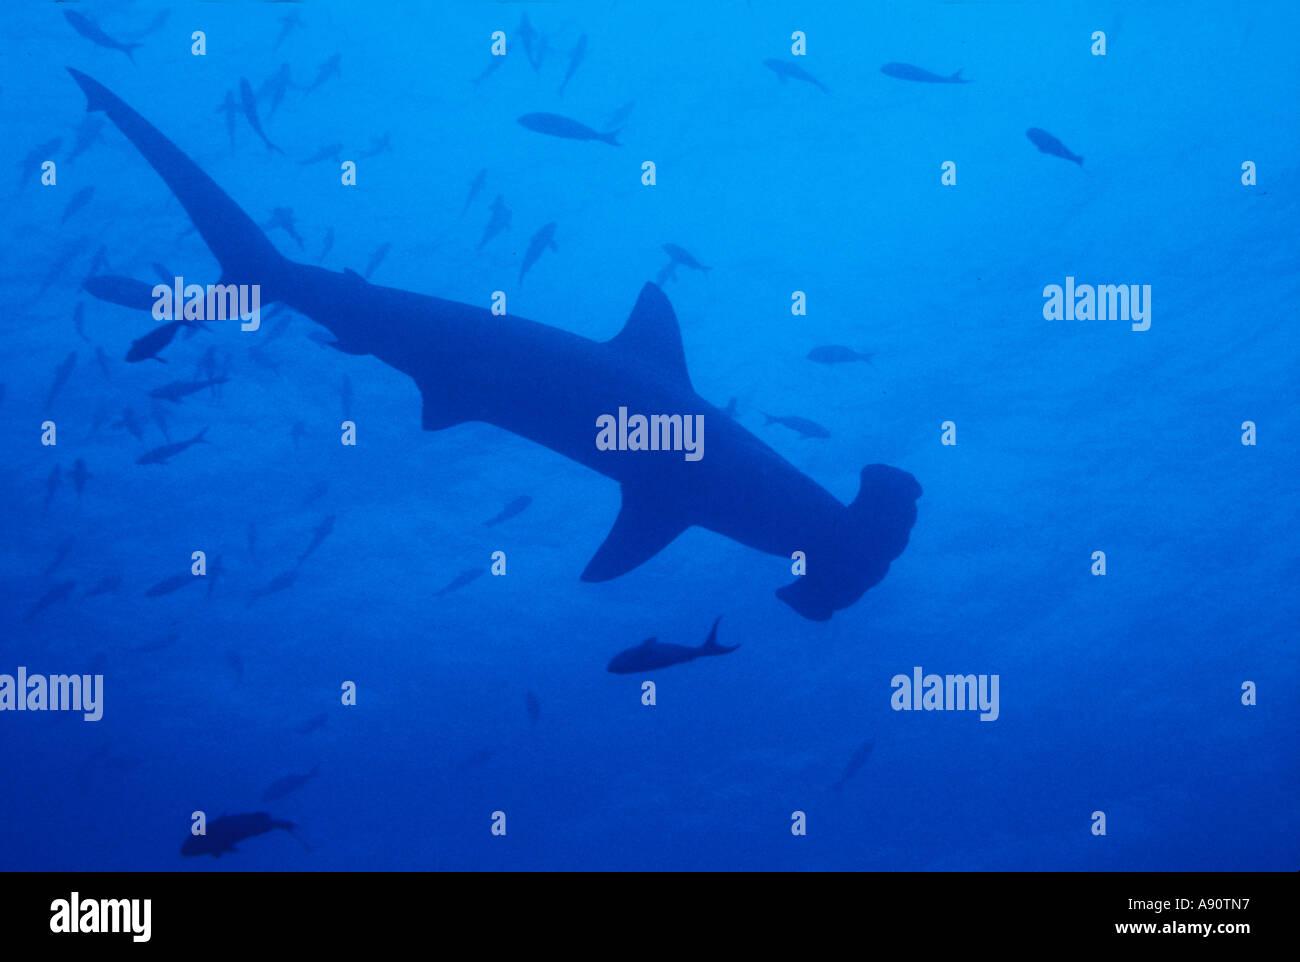 uf 269 hammerhead shark silhouette